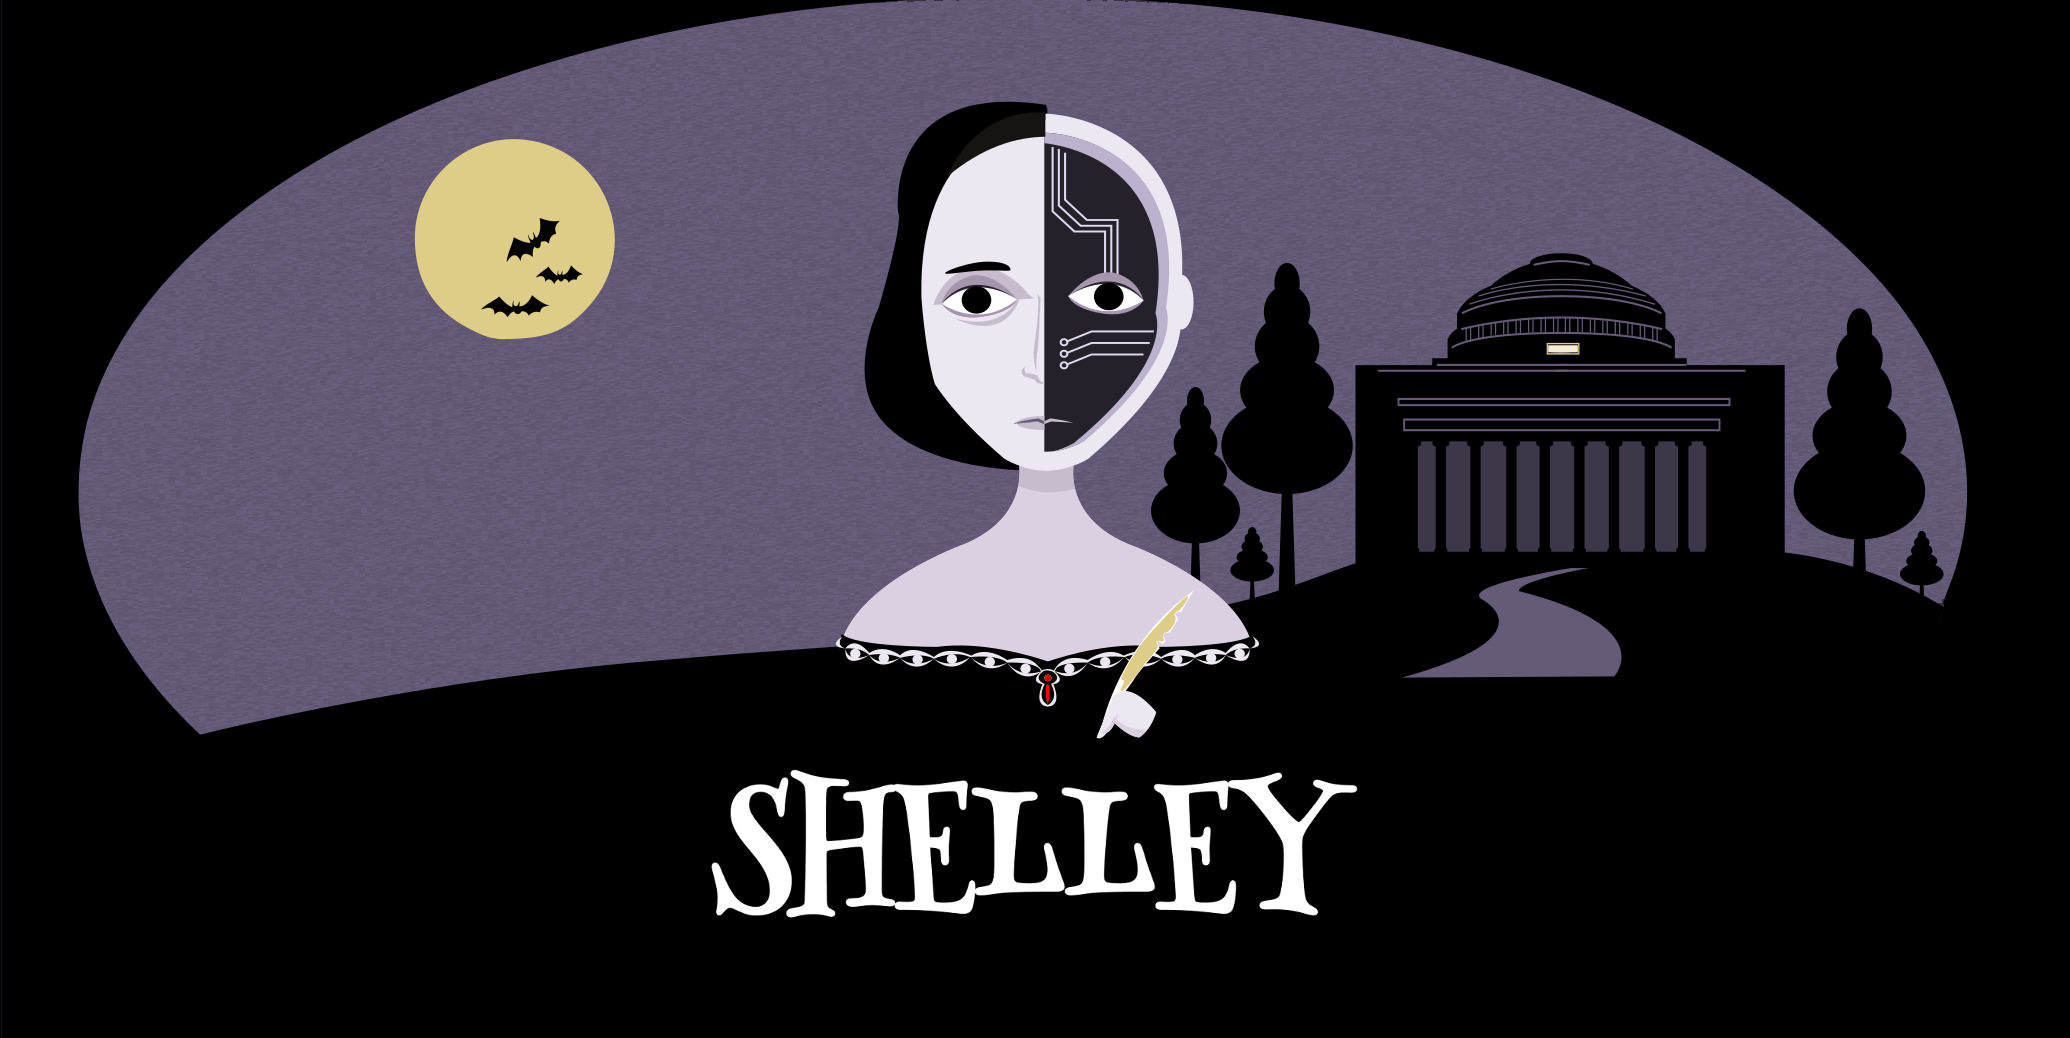 shelley_cover.jpg